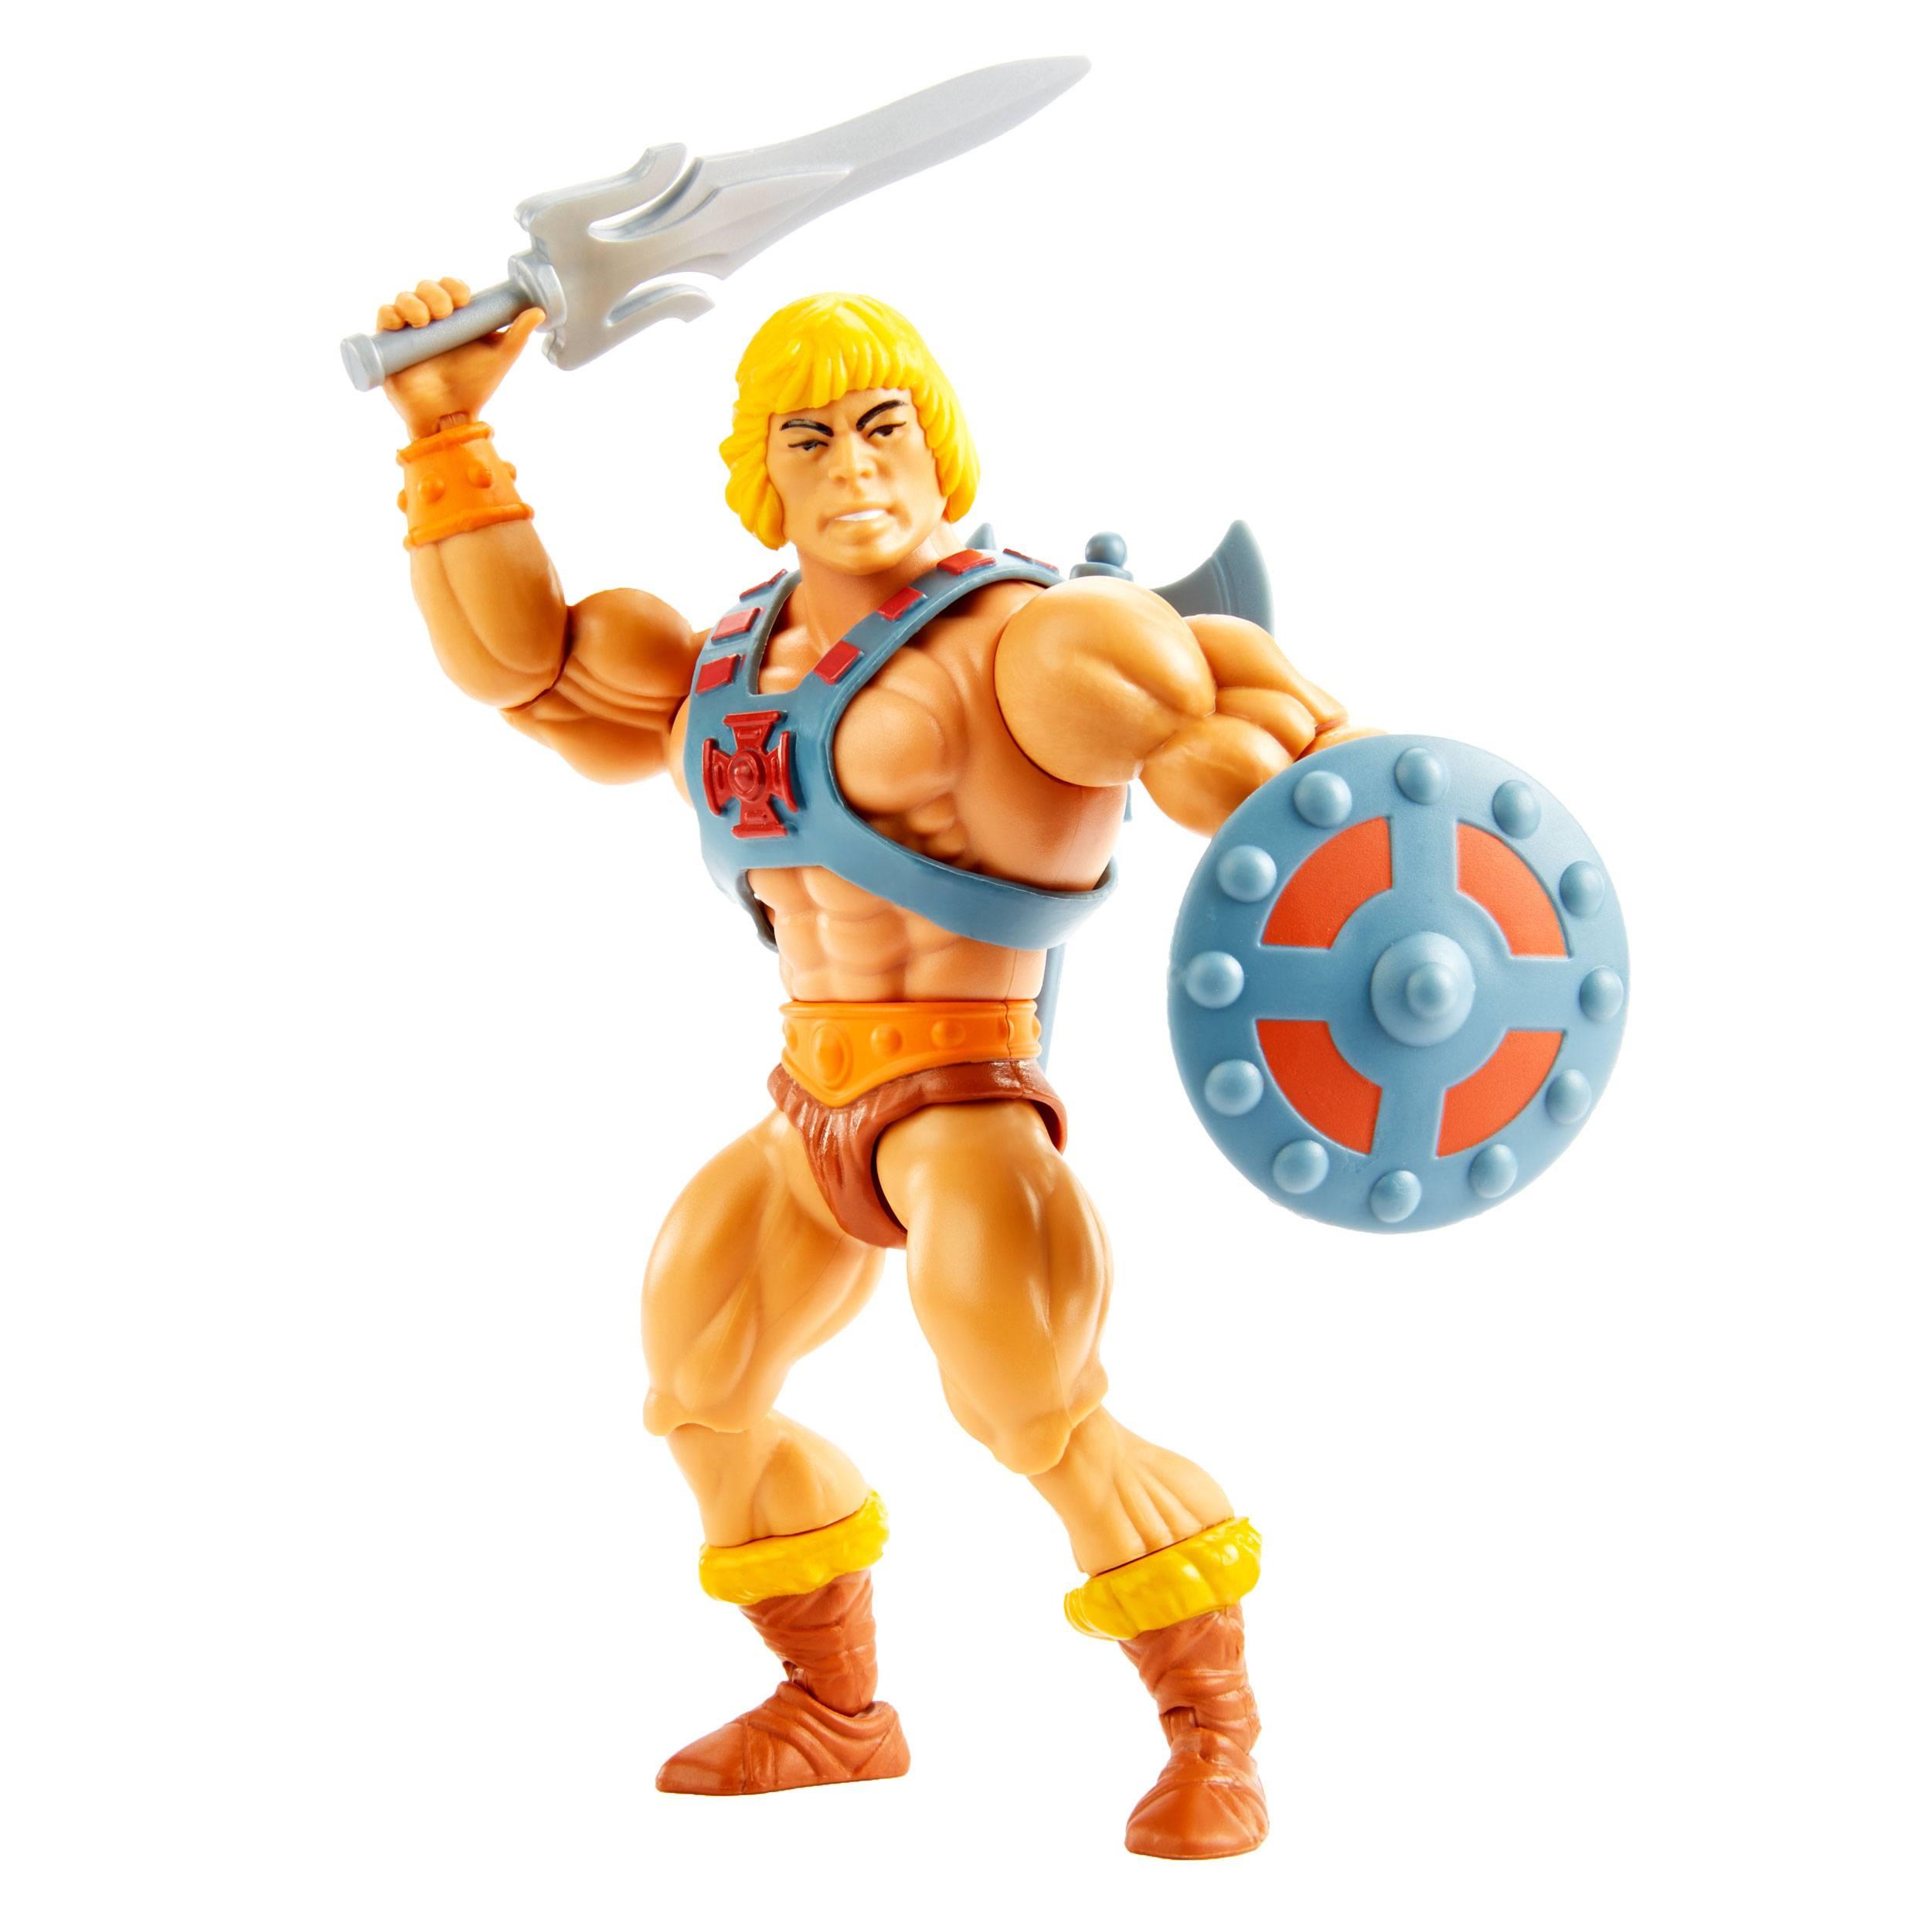 Masters of the Universe Origins Actionfigur 2021 Classic He-Man 14 cm MATTHGH44 0194735049110